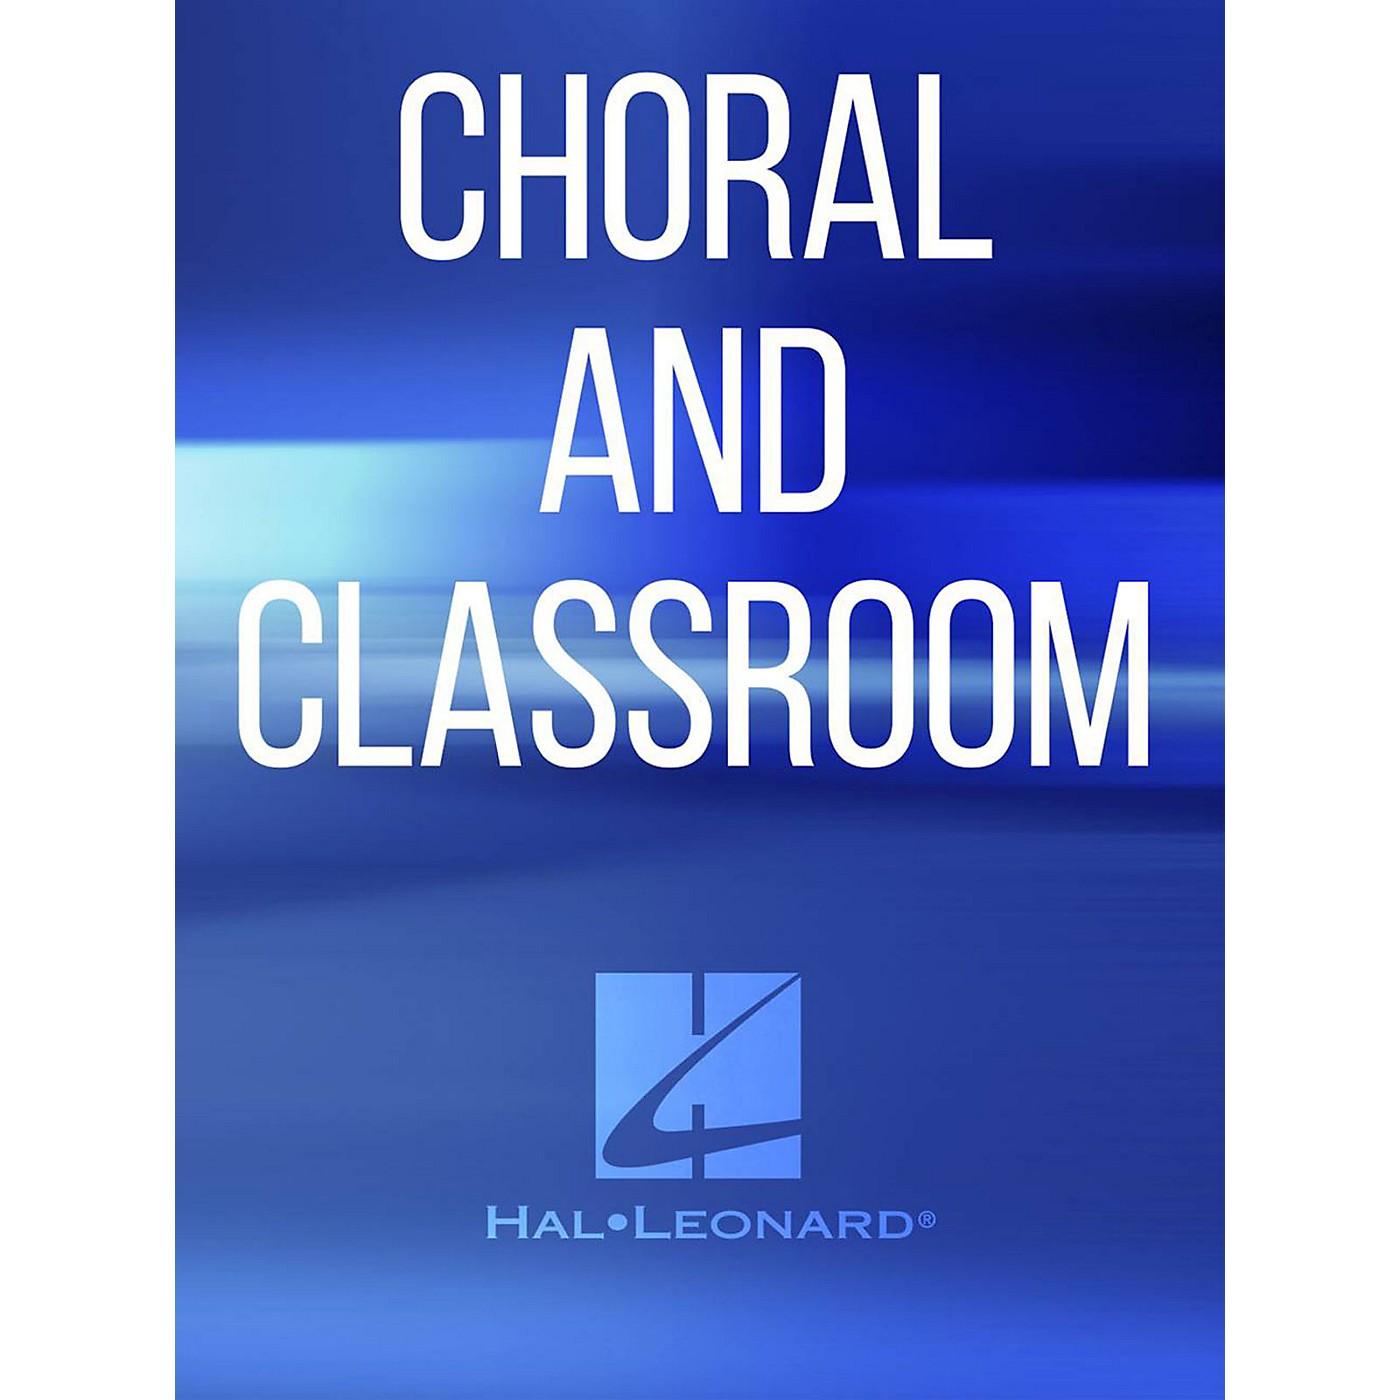 Hal Leonard My Valentine ShowTrax CD Arranged by Ed Lojeski thumbnail